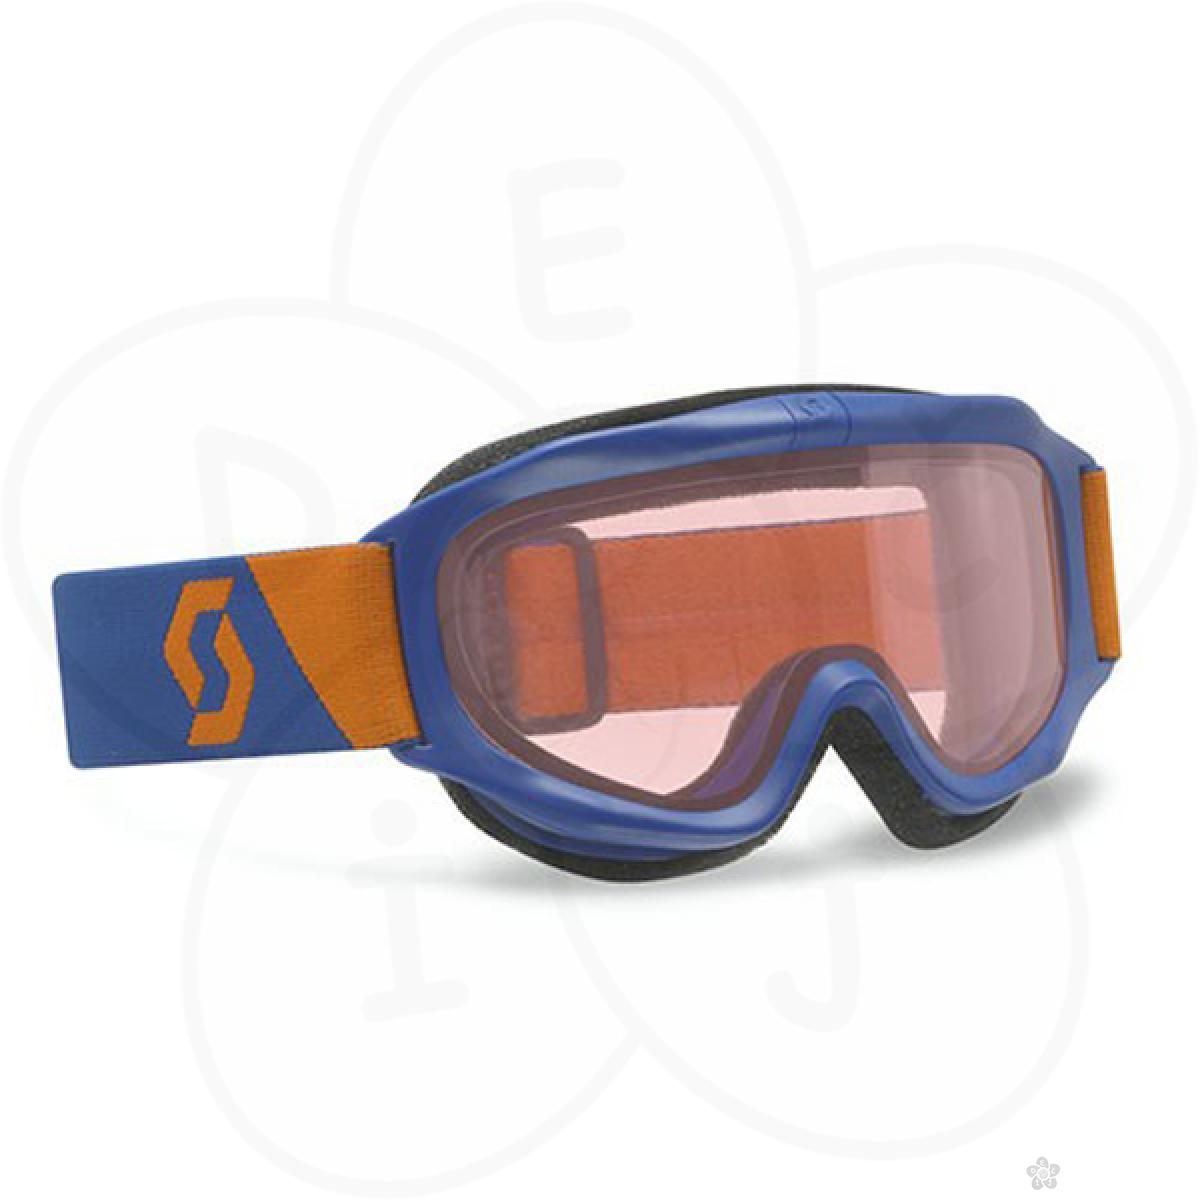 Naočare za skijanje Scott TRACER tml blue-light amplifier, SC2365230003005